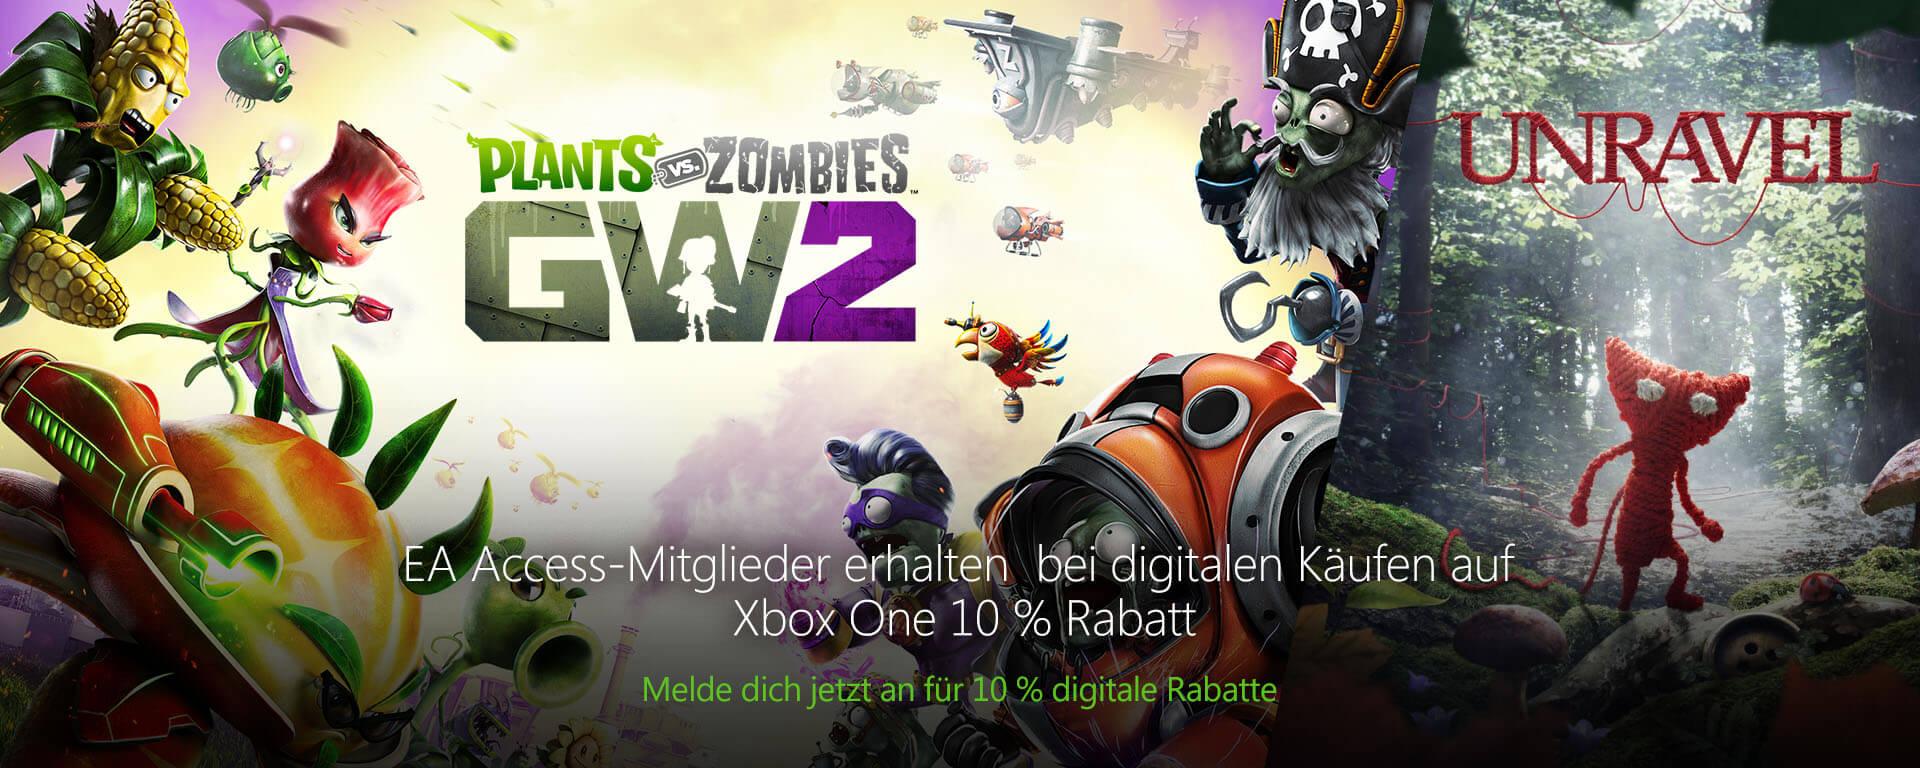 Plants vs Zombies: Garden Warfare 2   Unravel   EA Access   Xbox One